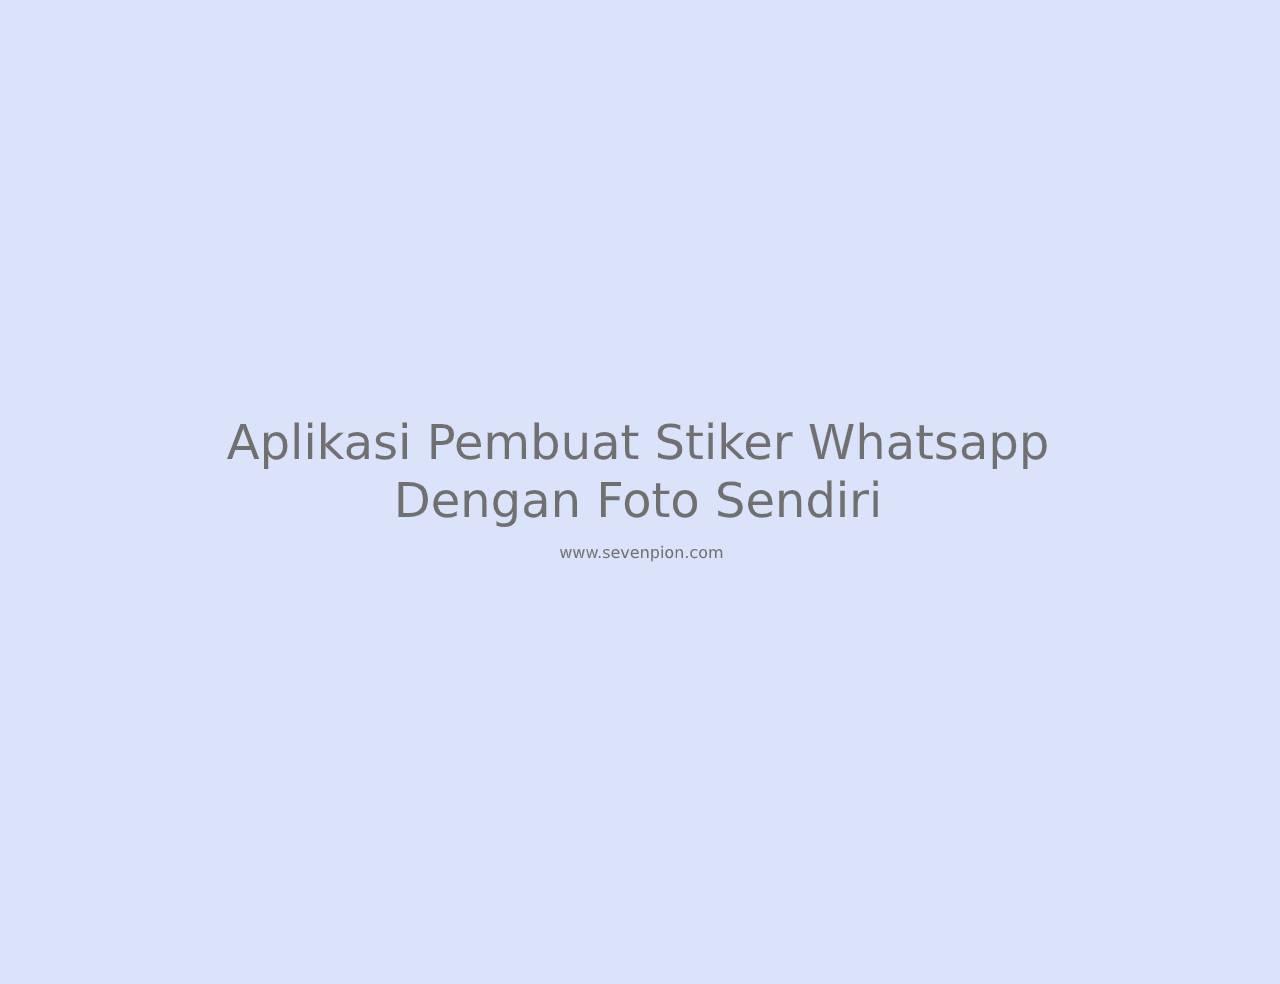 aplikasi pembuat stiker whatsapp